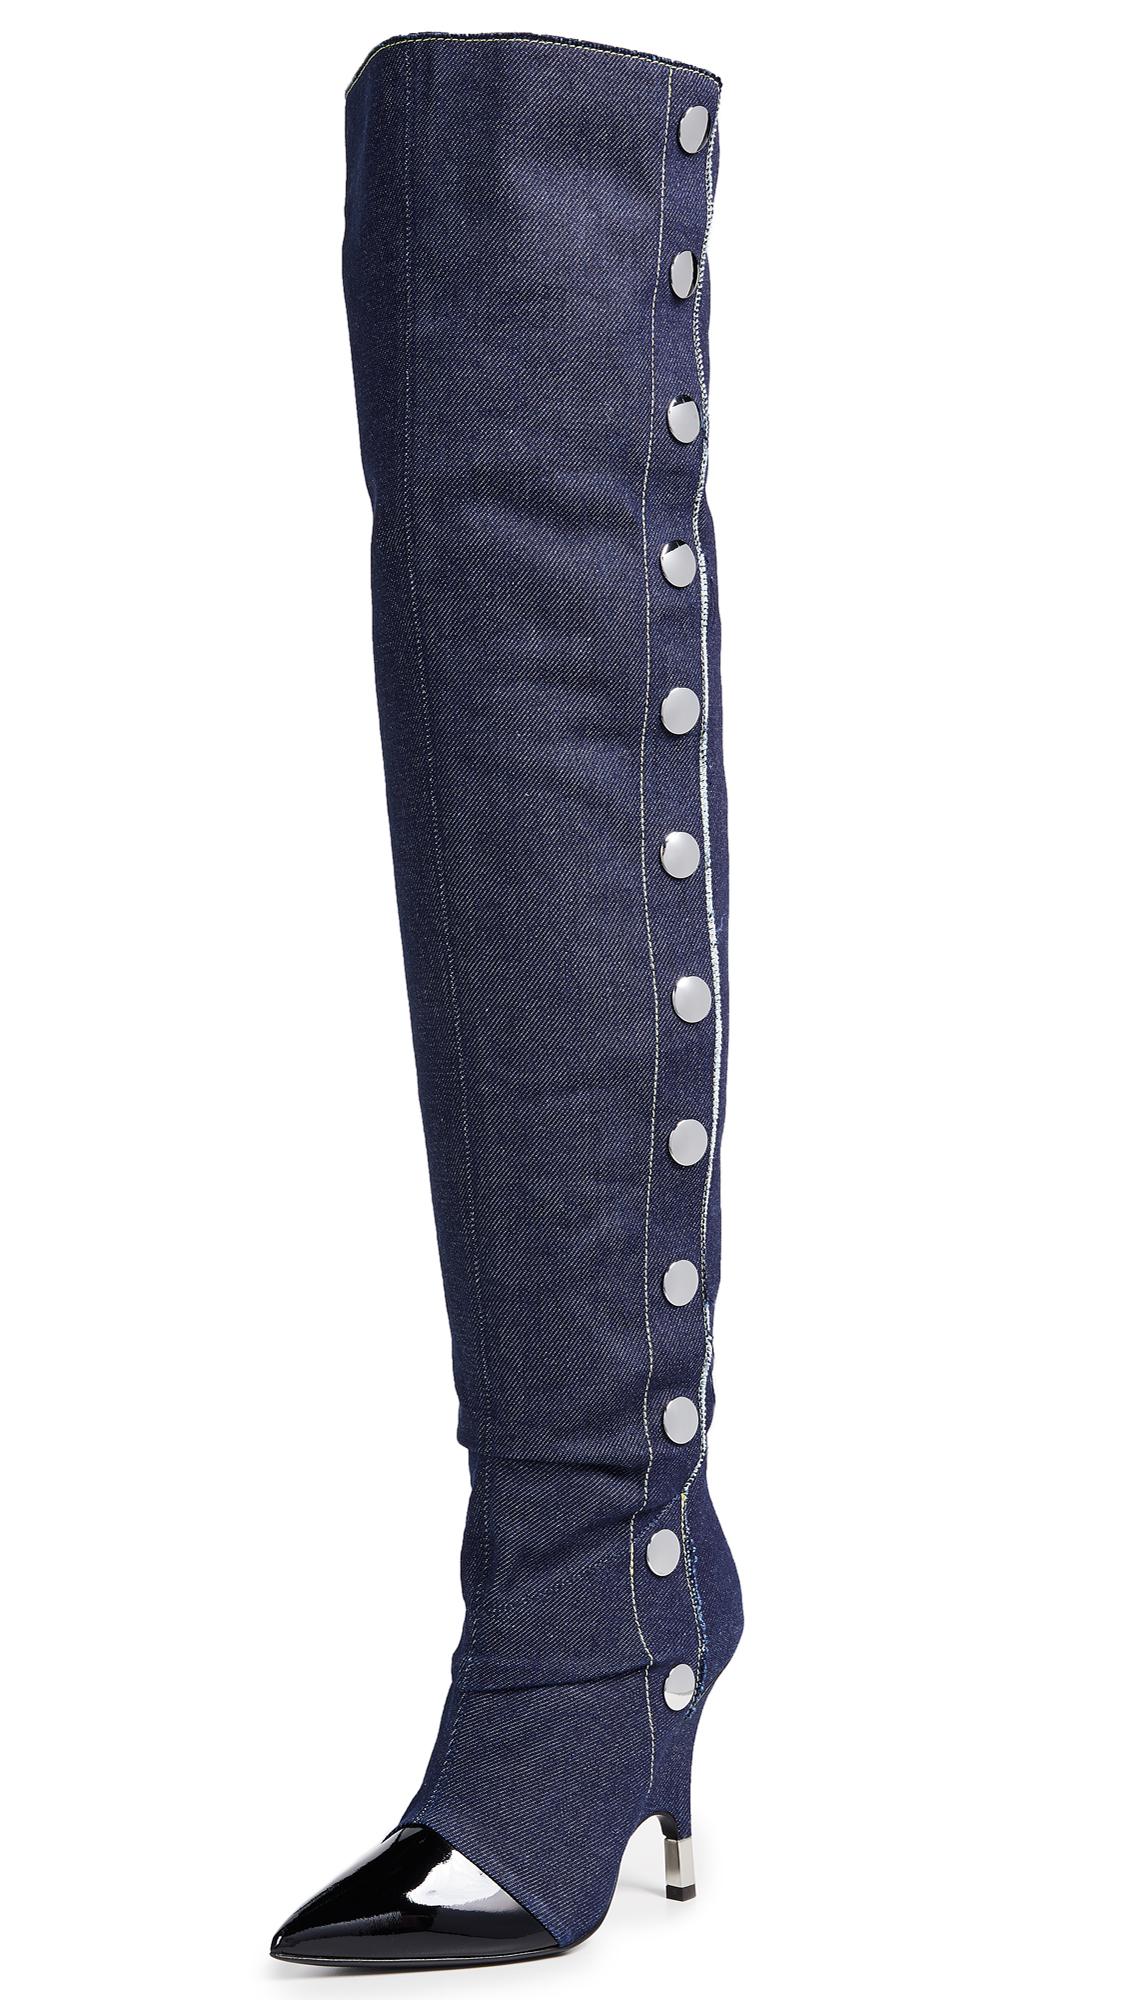 Giuseppe Zanotti Stud Thigh High Boots - Nero